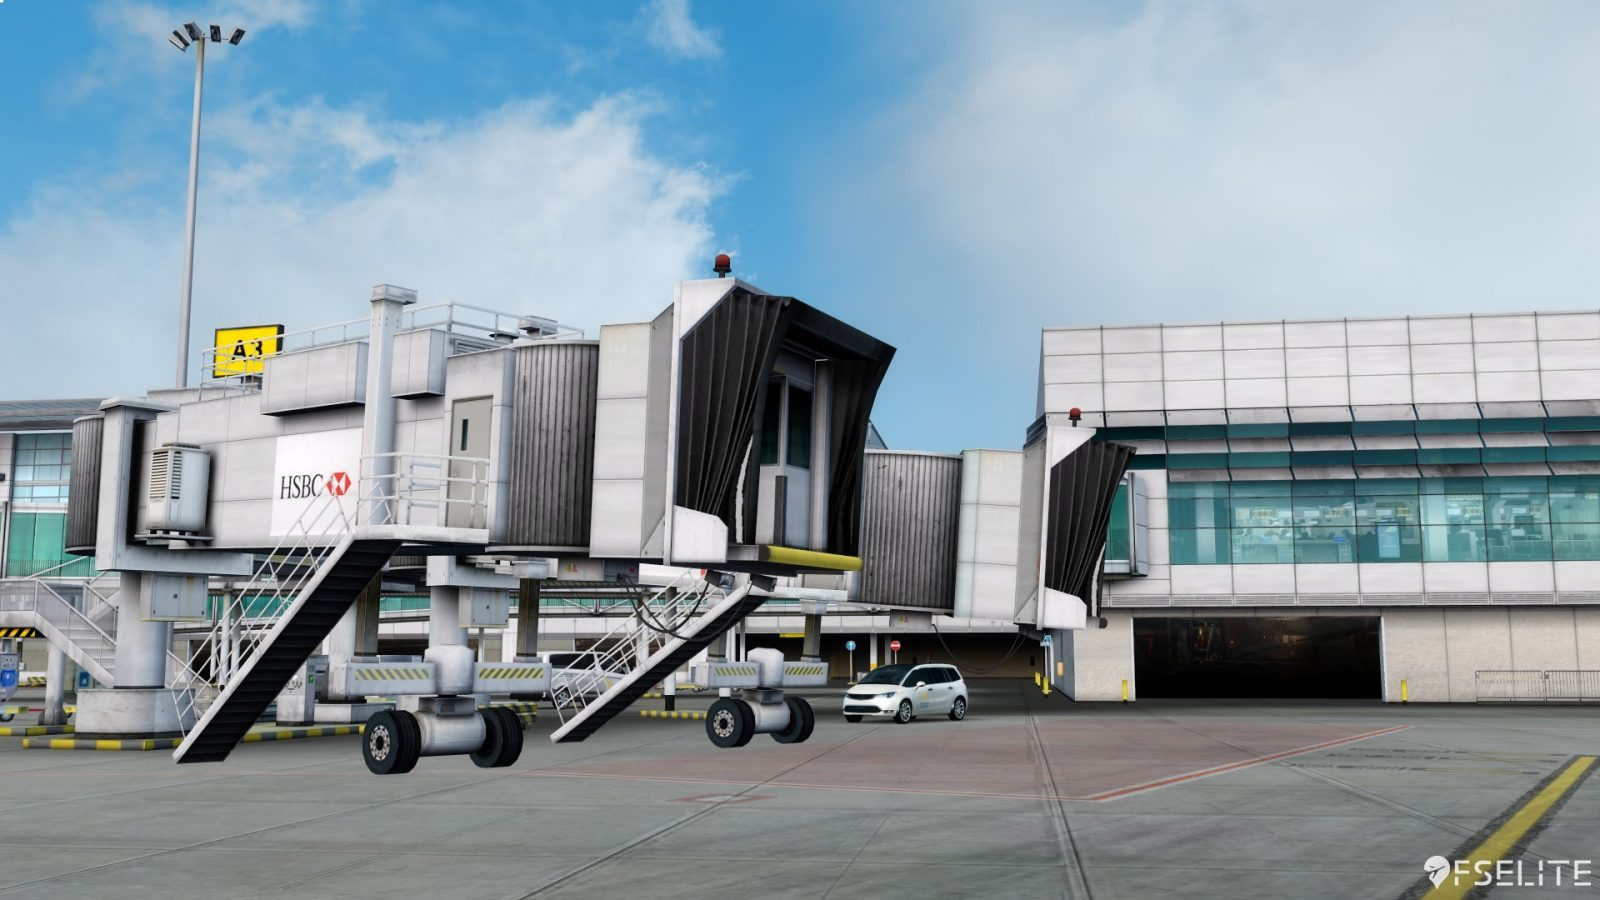 Ang dating daan singapore airport